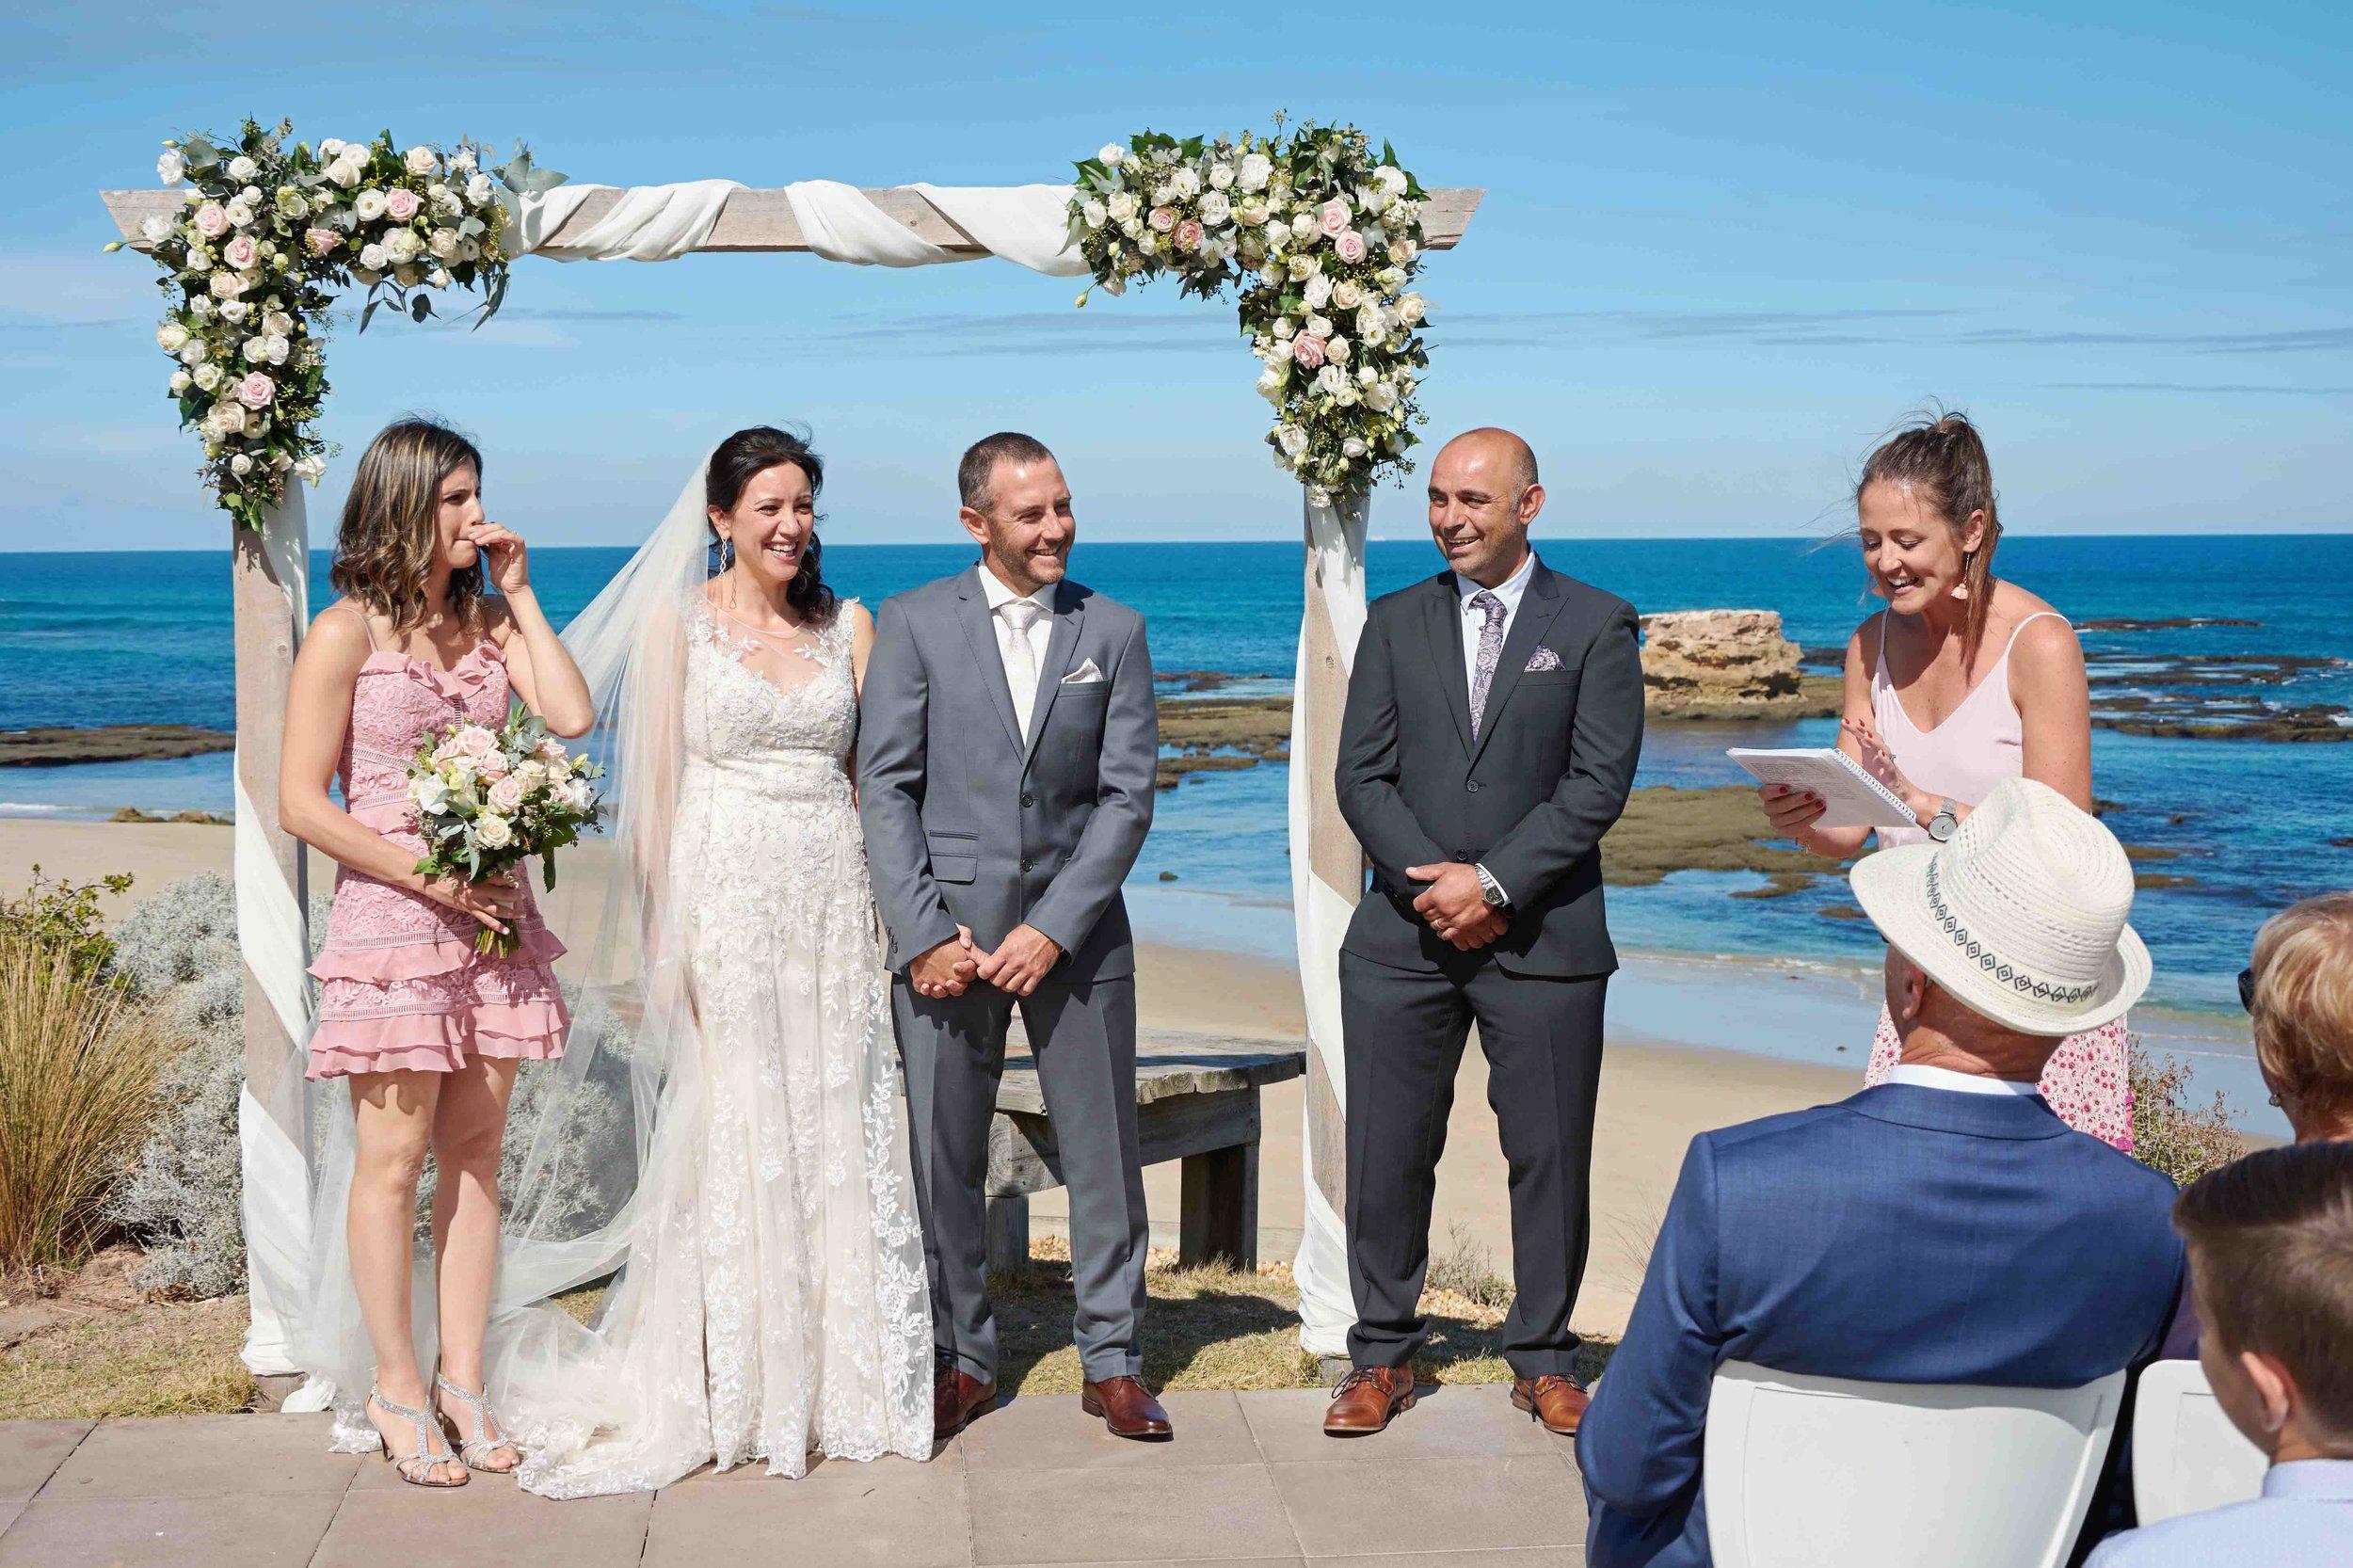 sorrento-wedding-photography-all-smiles-marissa-jade-photography-42.jpg